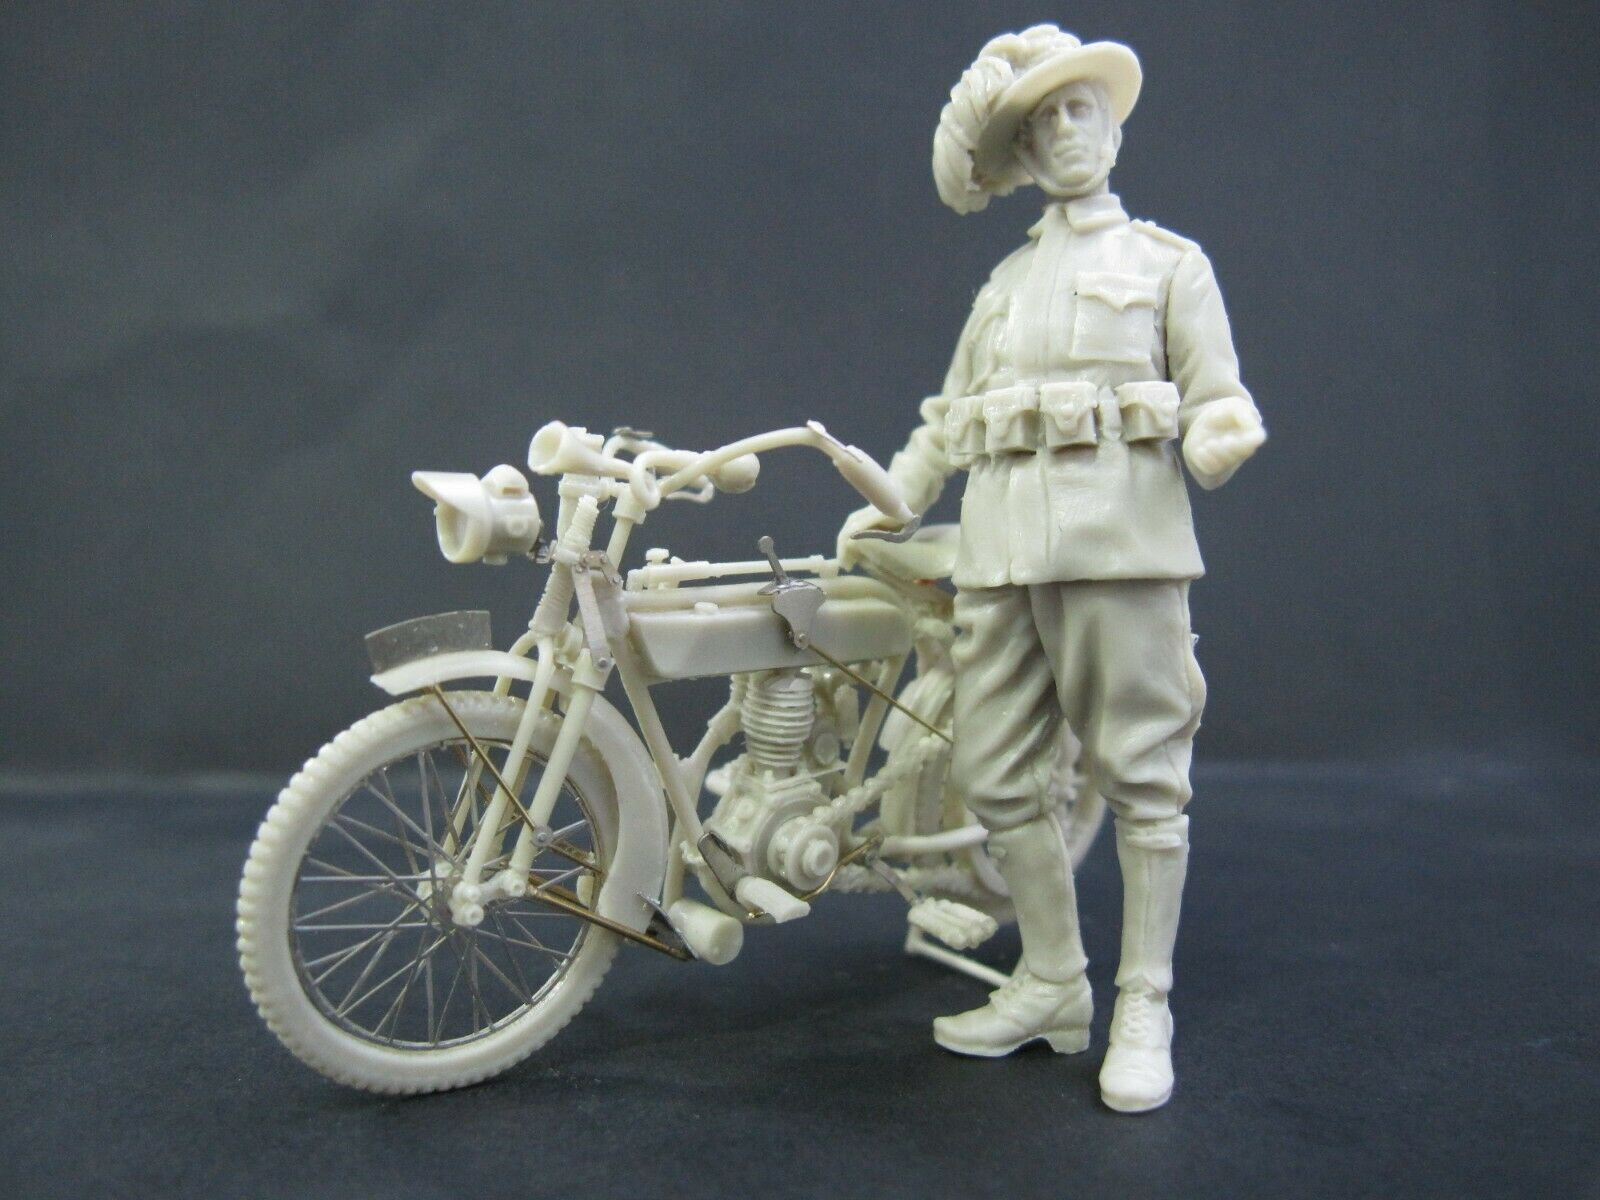 CIX MODELS CixM019 ITALIAN FRERA 4HP 1914 MILITARY CON BERSAGLIERE WW1 1 35